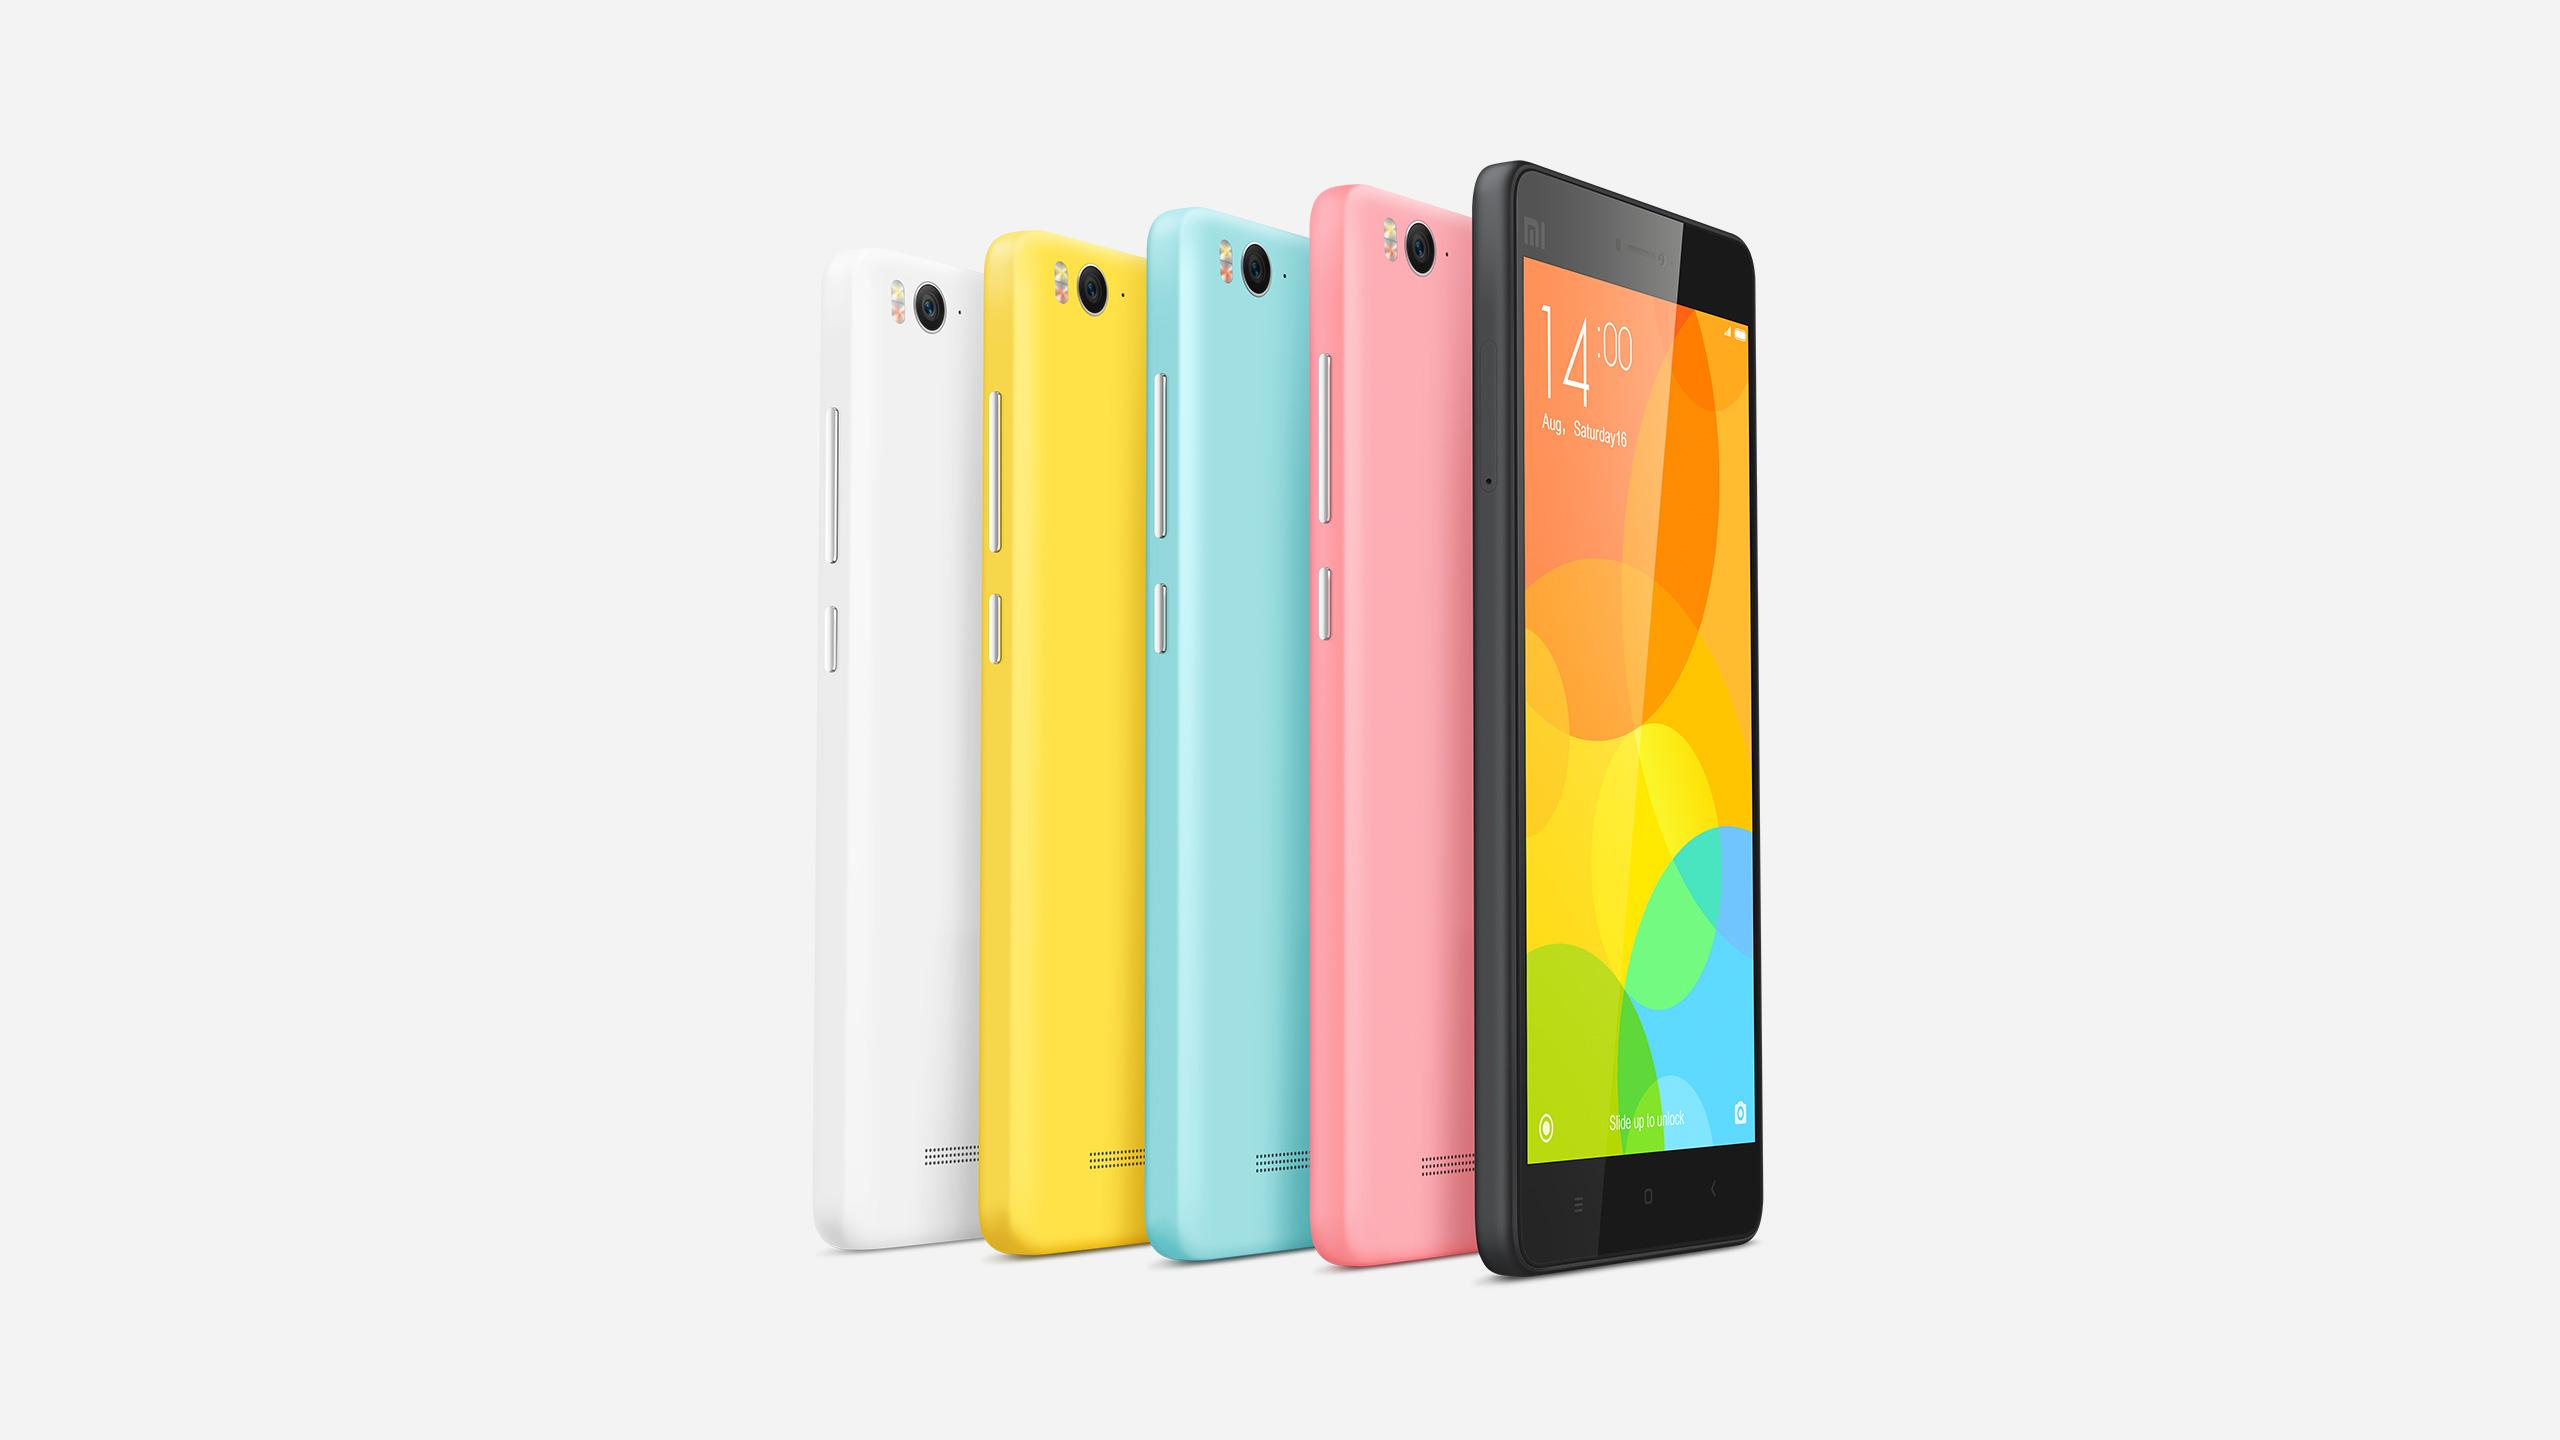 Xiaomi Mi 4i launch event in India